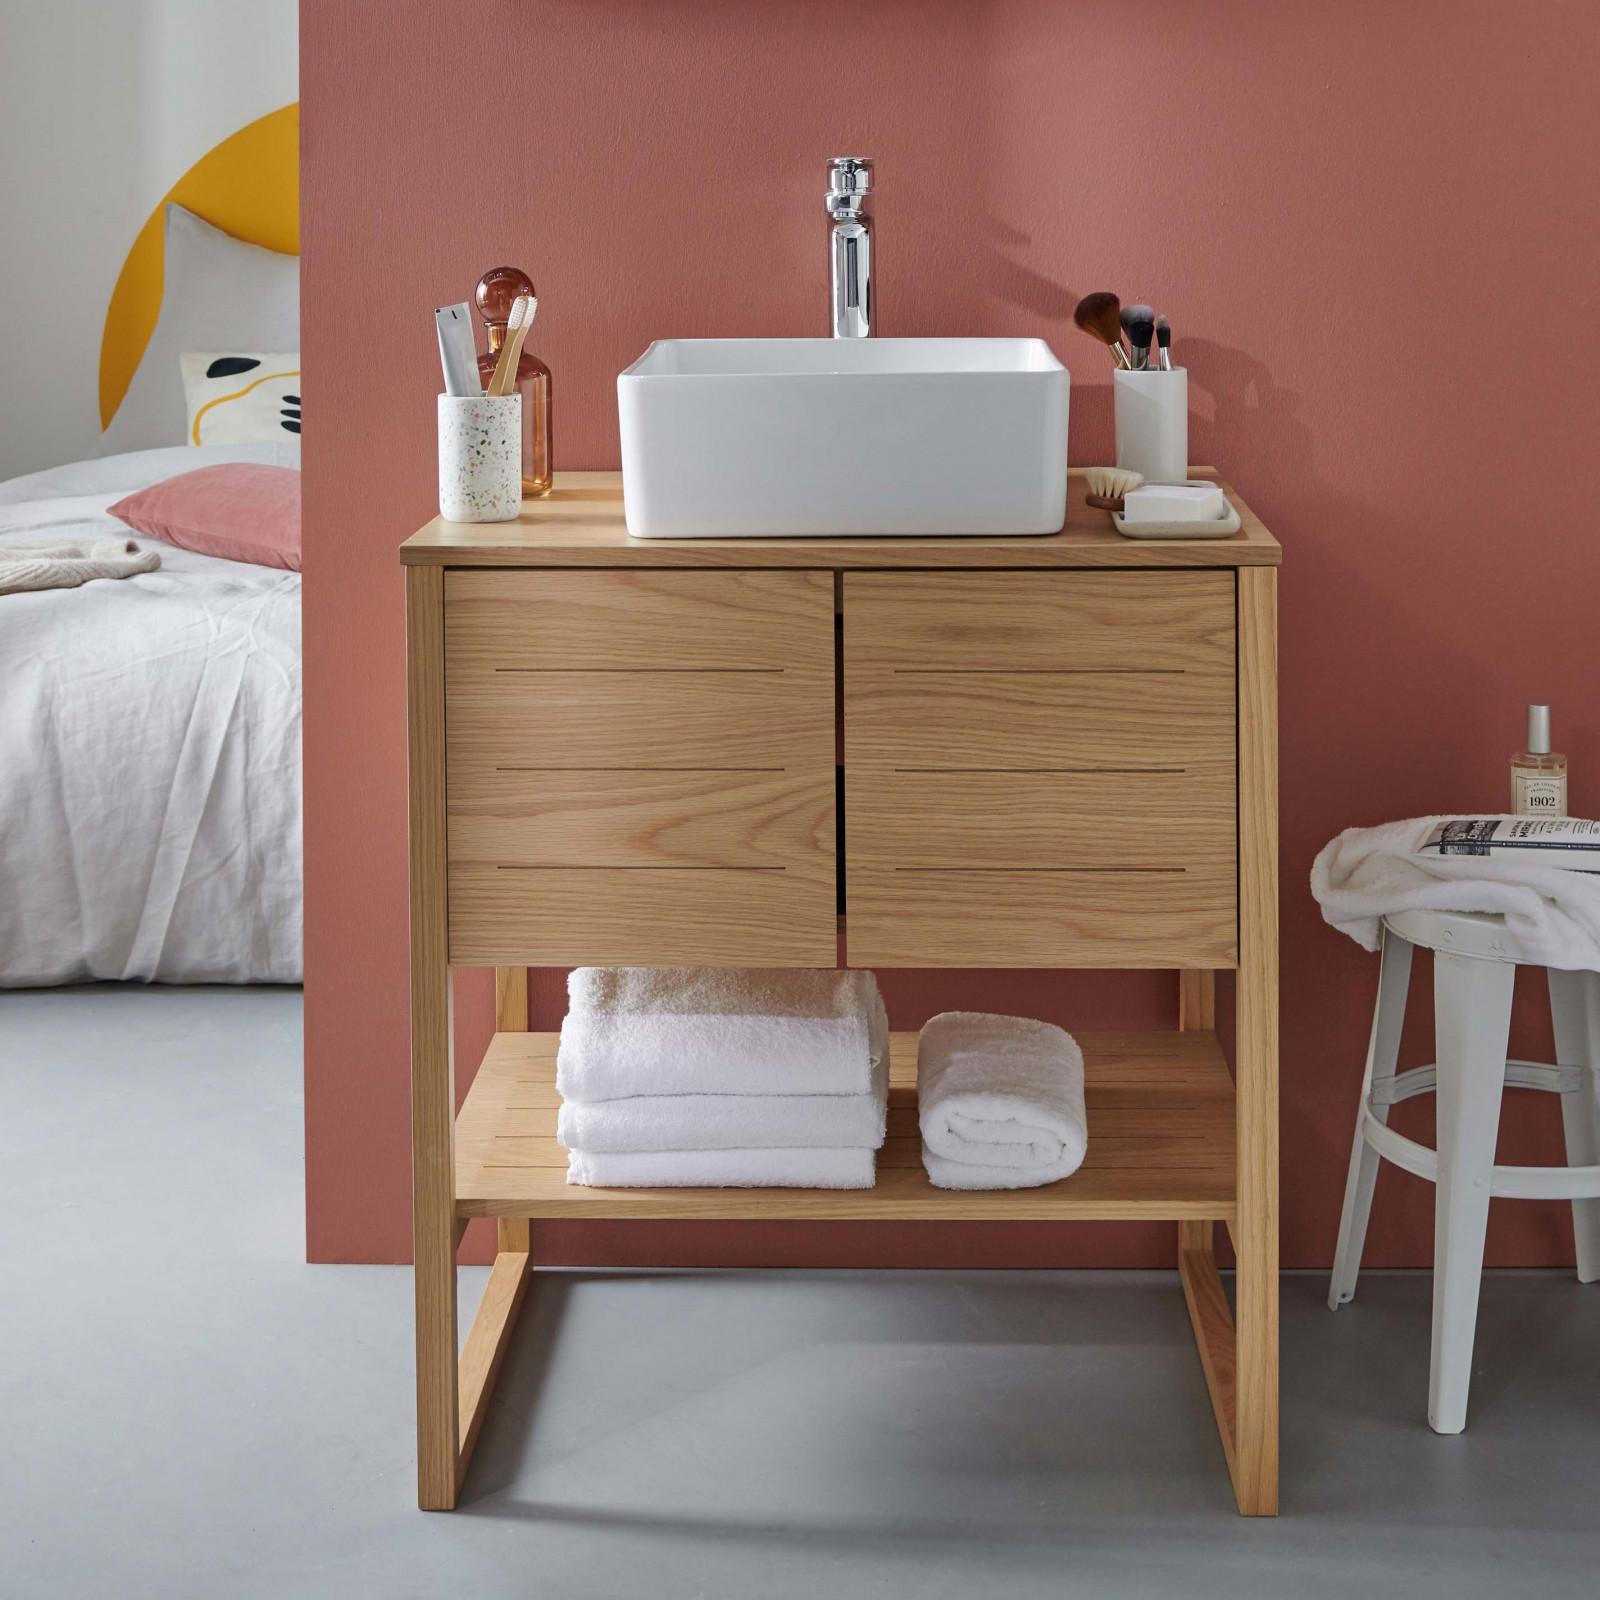 Meuble de salle de bain avec vasque effet bois clair